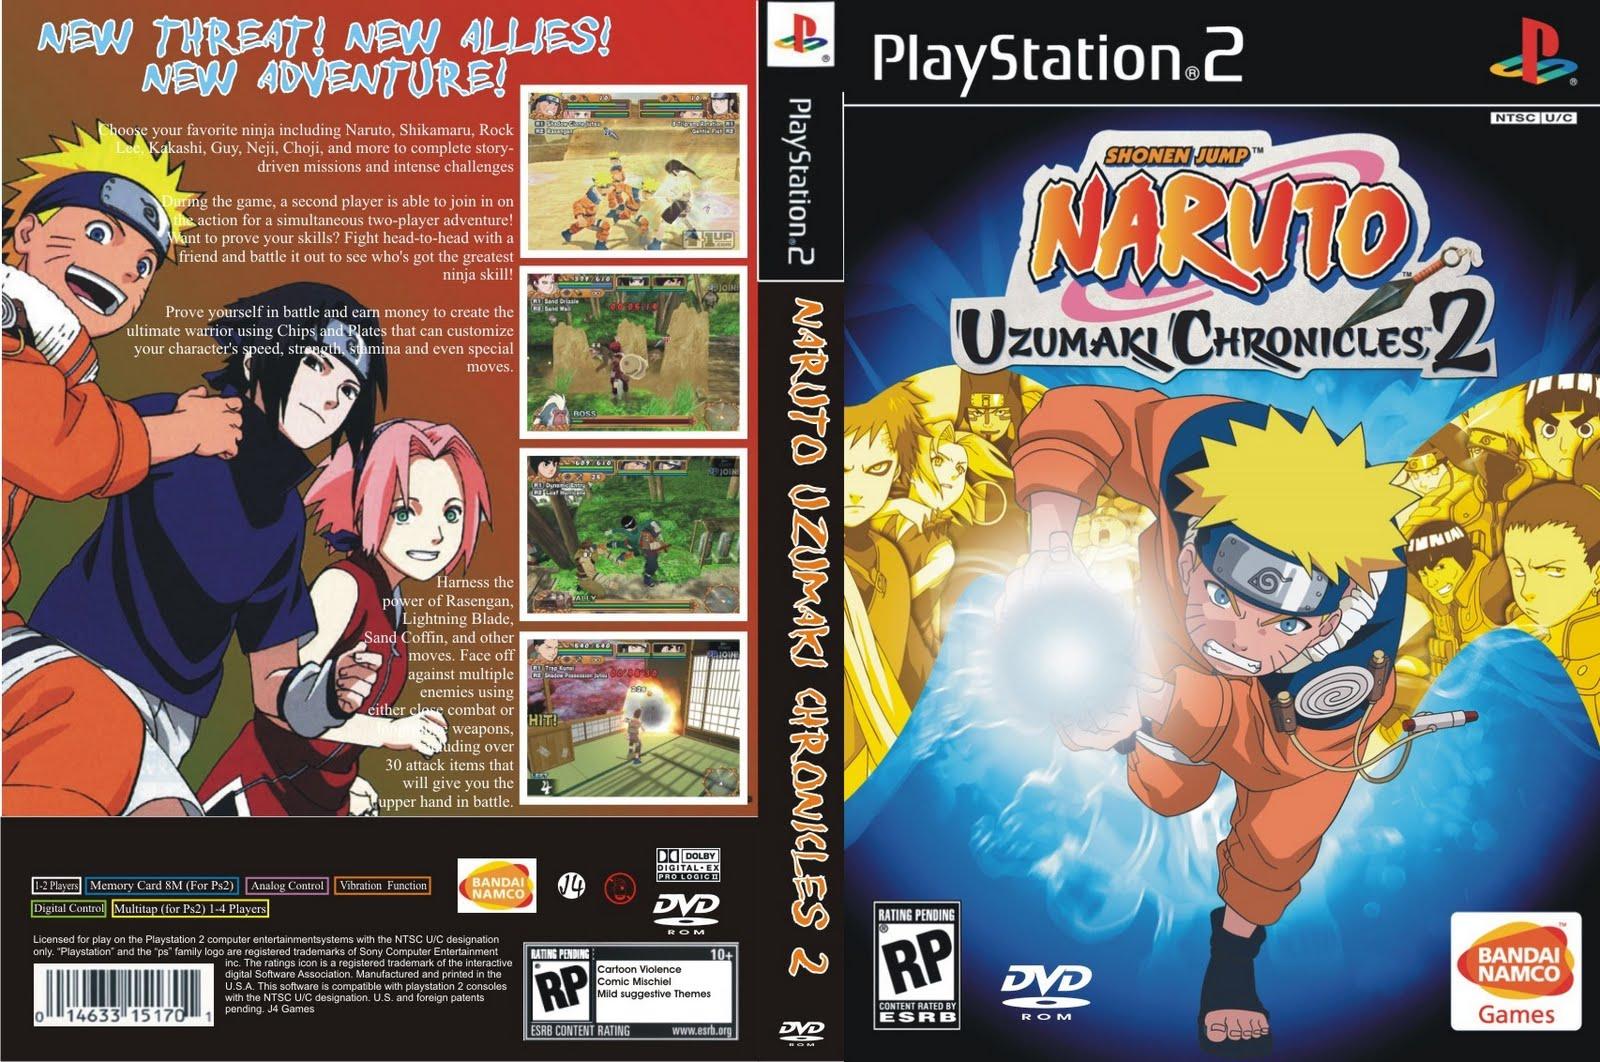 Download Naruto Uzumaki Chronicles 2 Ps2 Games | Auto Design Tech